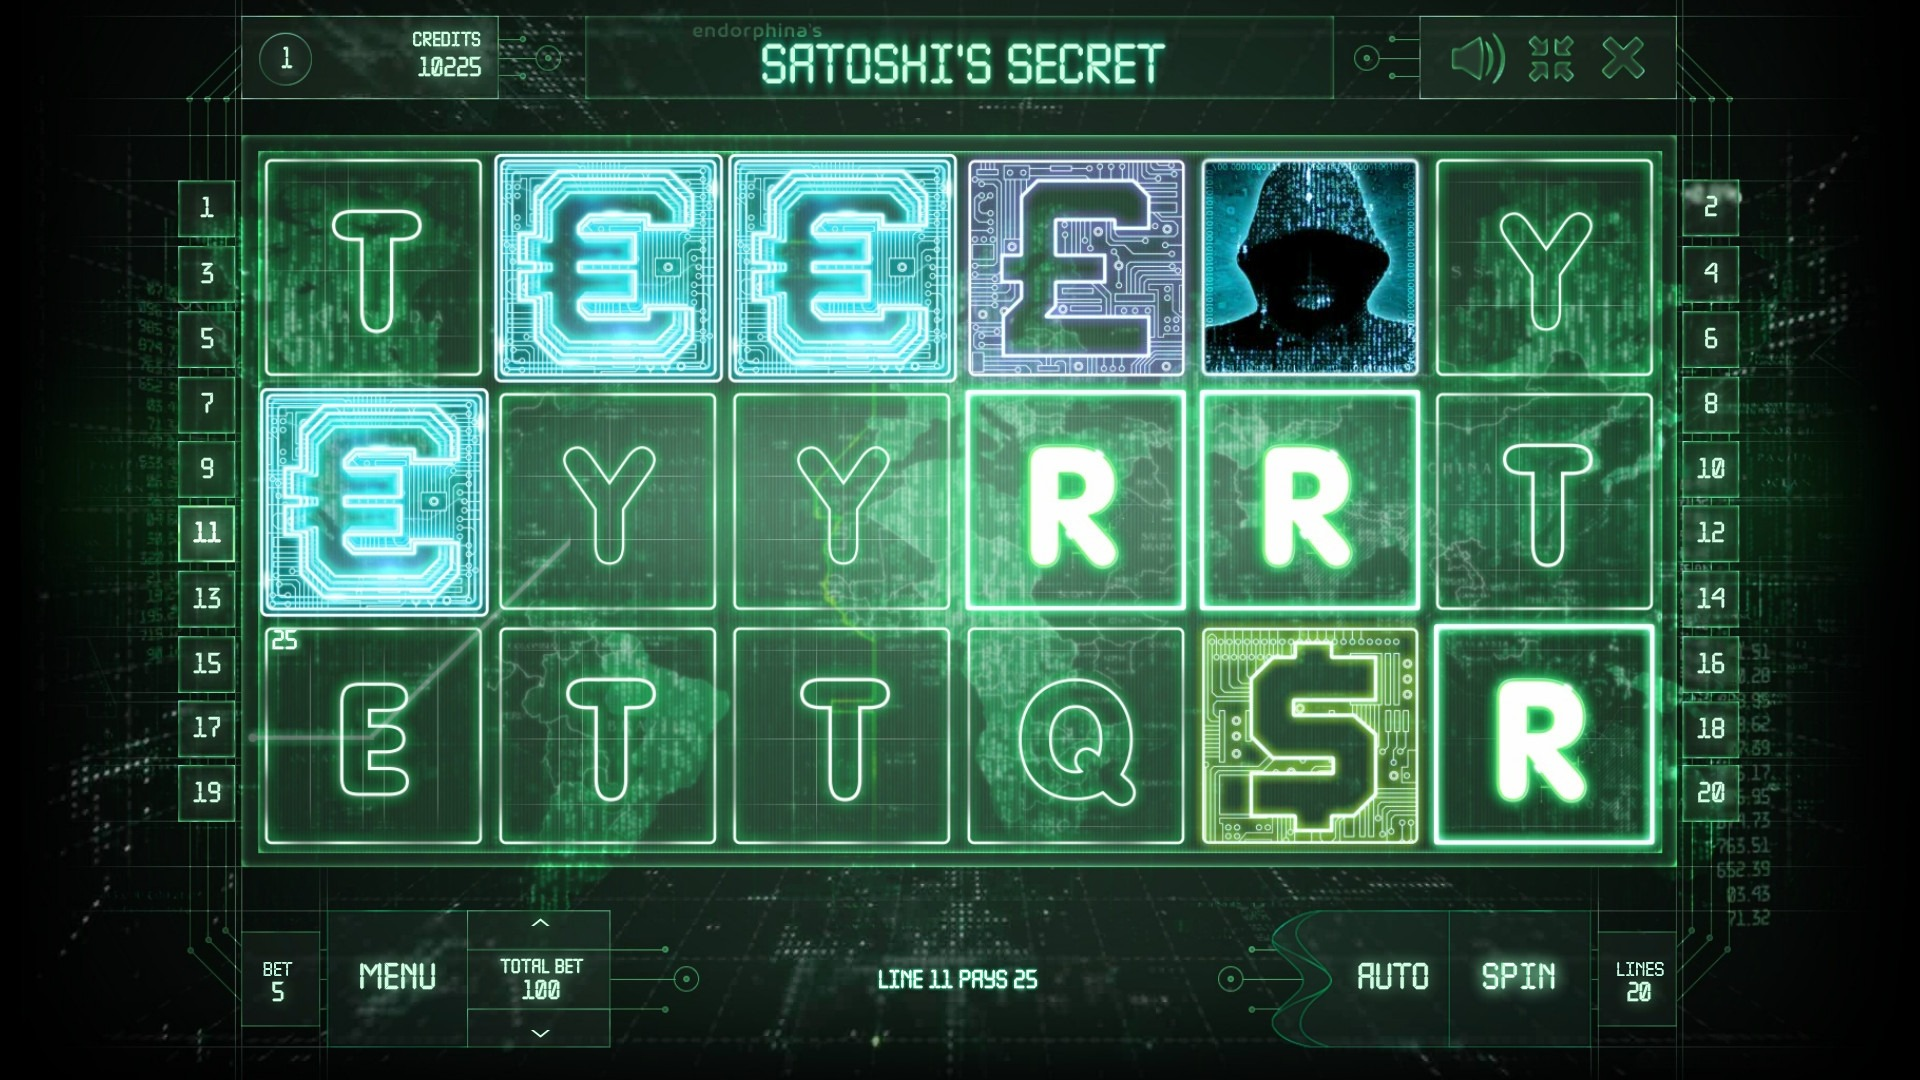 Satoshi's Secret Slot Machine - How to Play